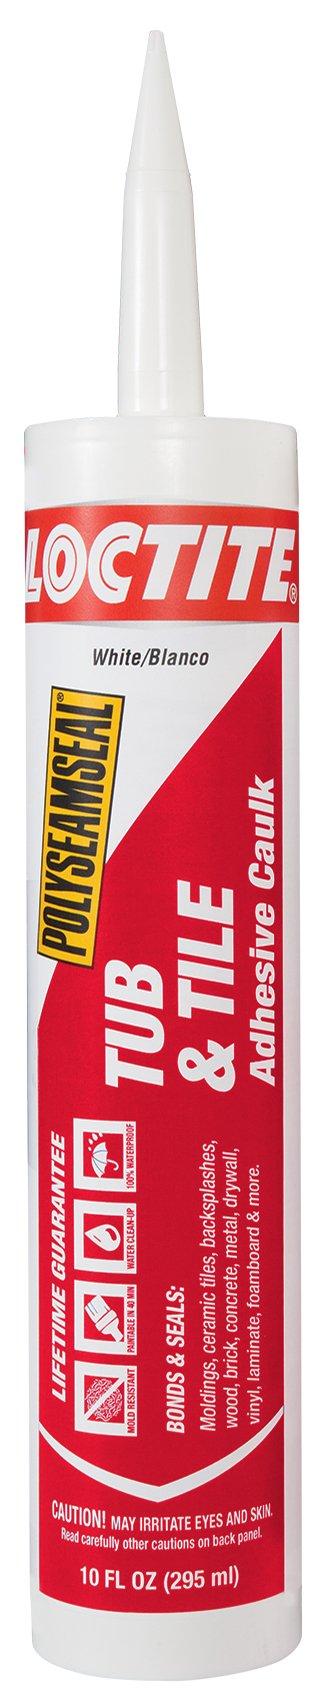 Loctite Polyseamseal White Tub and Tile Sealant, 10-Fluid Ounce Cartridge (2154739)